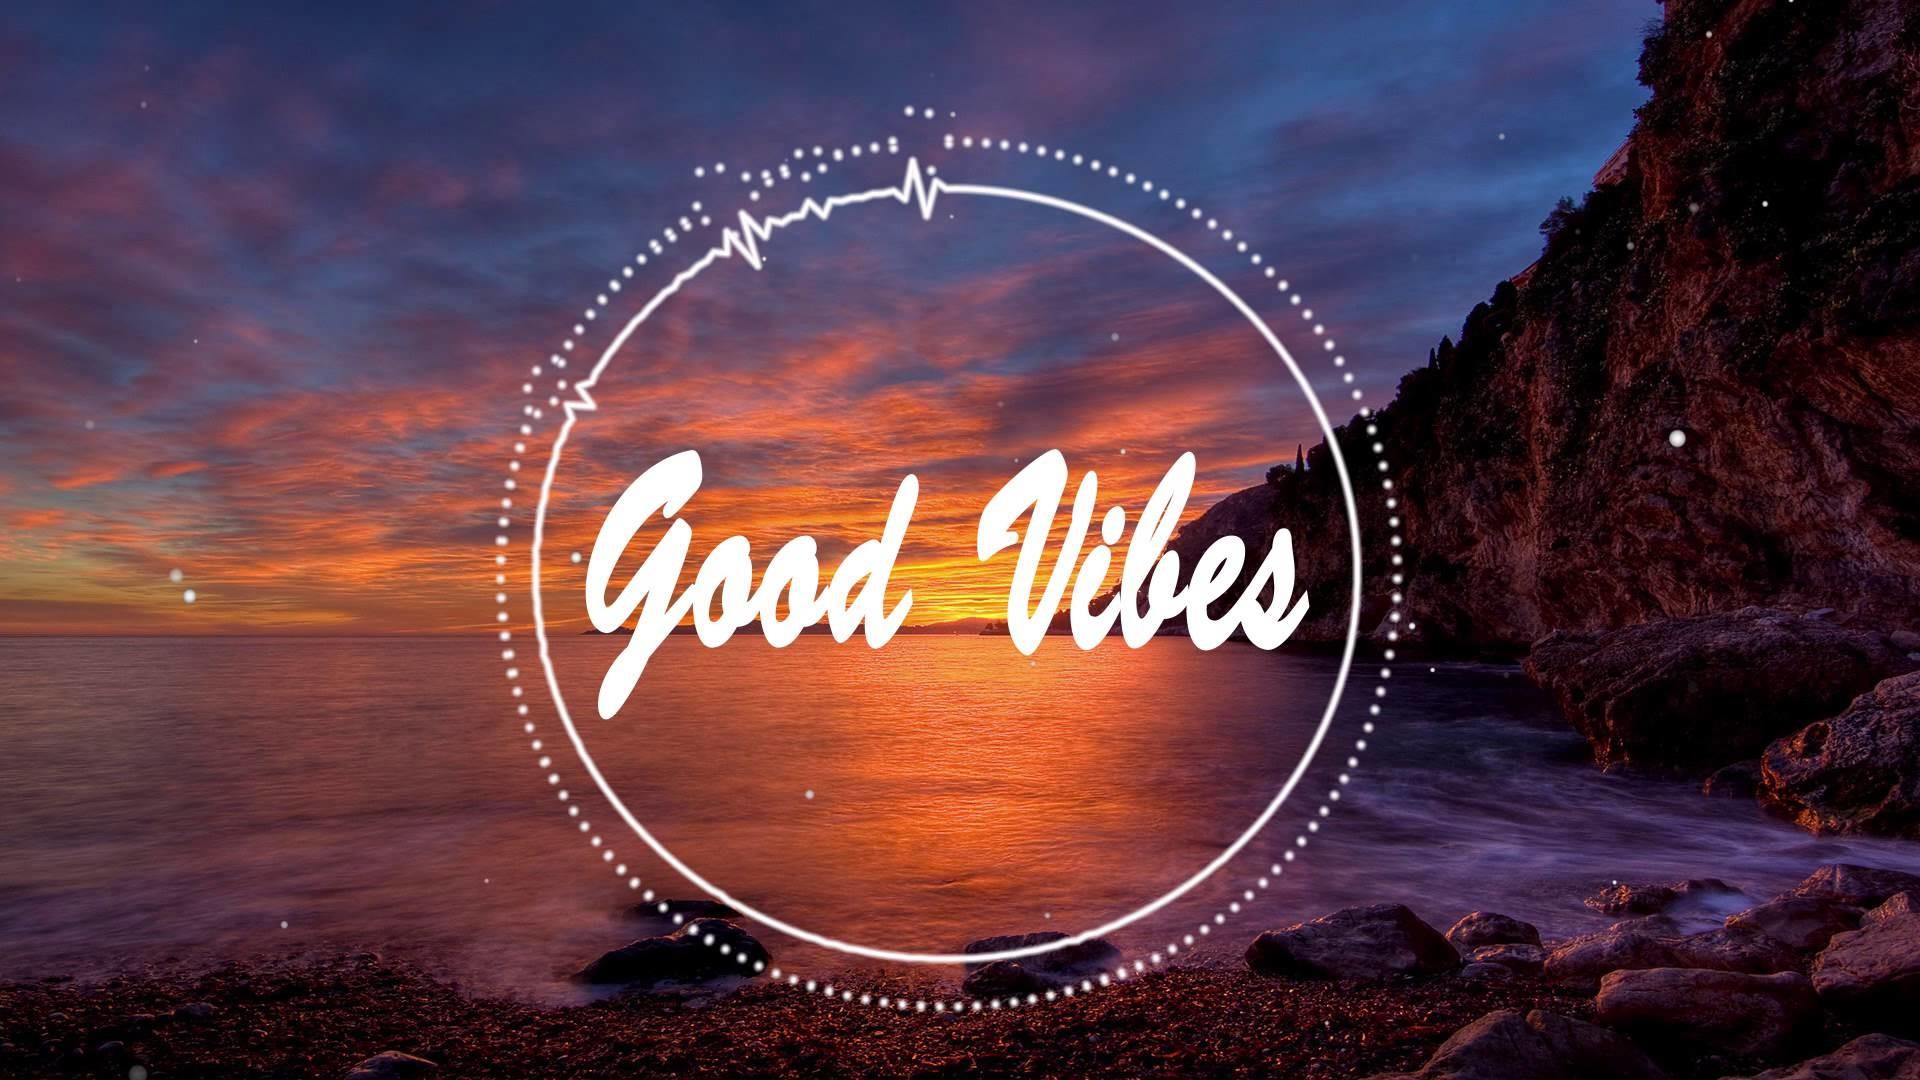 good vibes wallpaper 62987